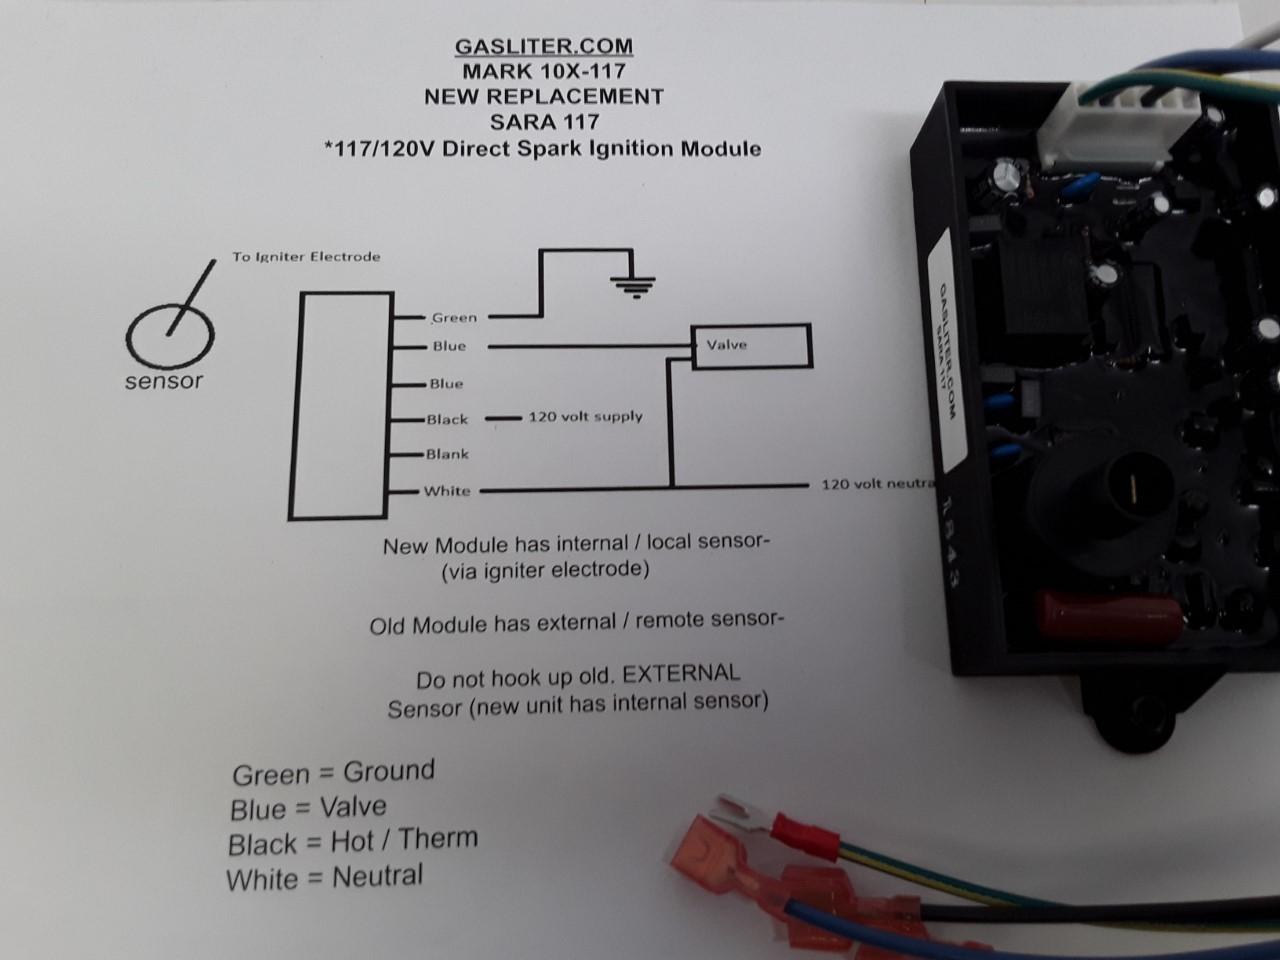 sara 117x – ( 117v dsi w/ wiring harness ) | gasliter.com  gasliter.com